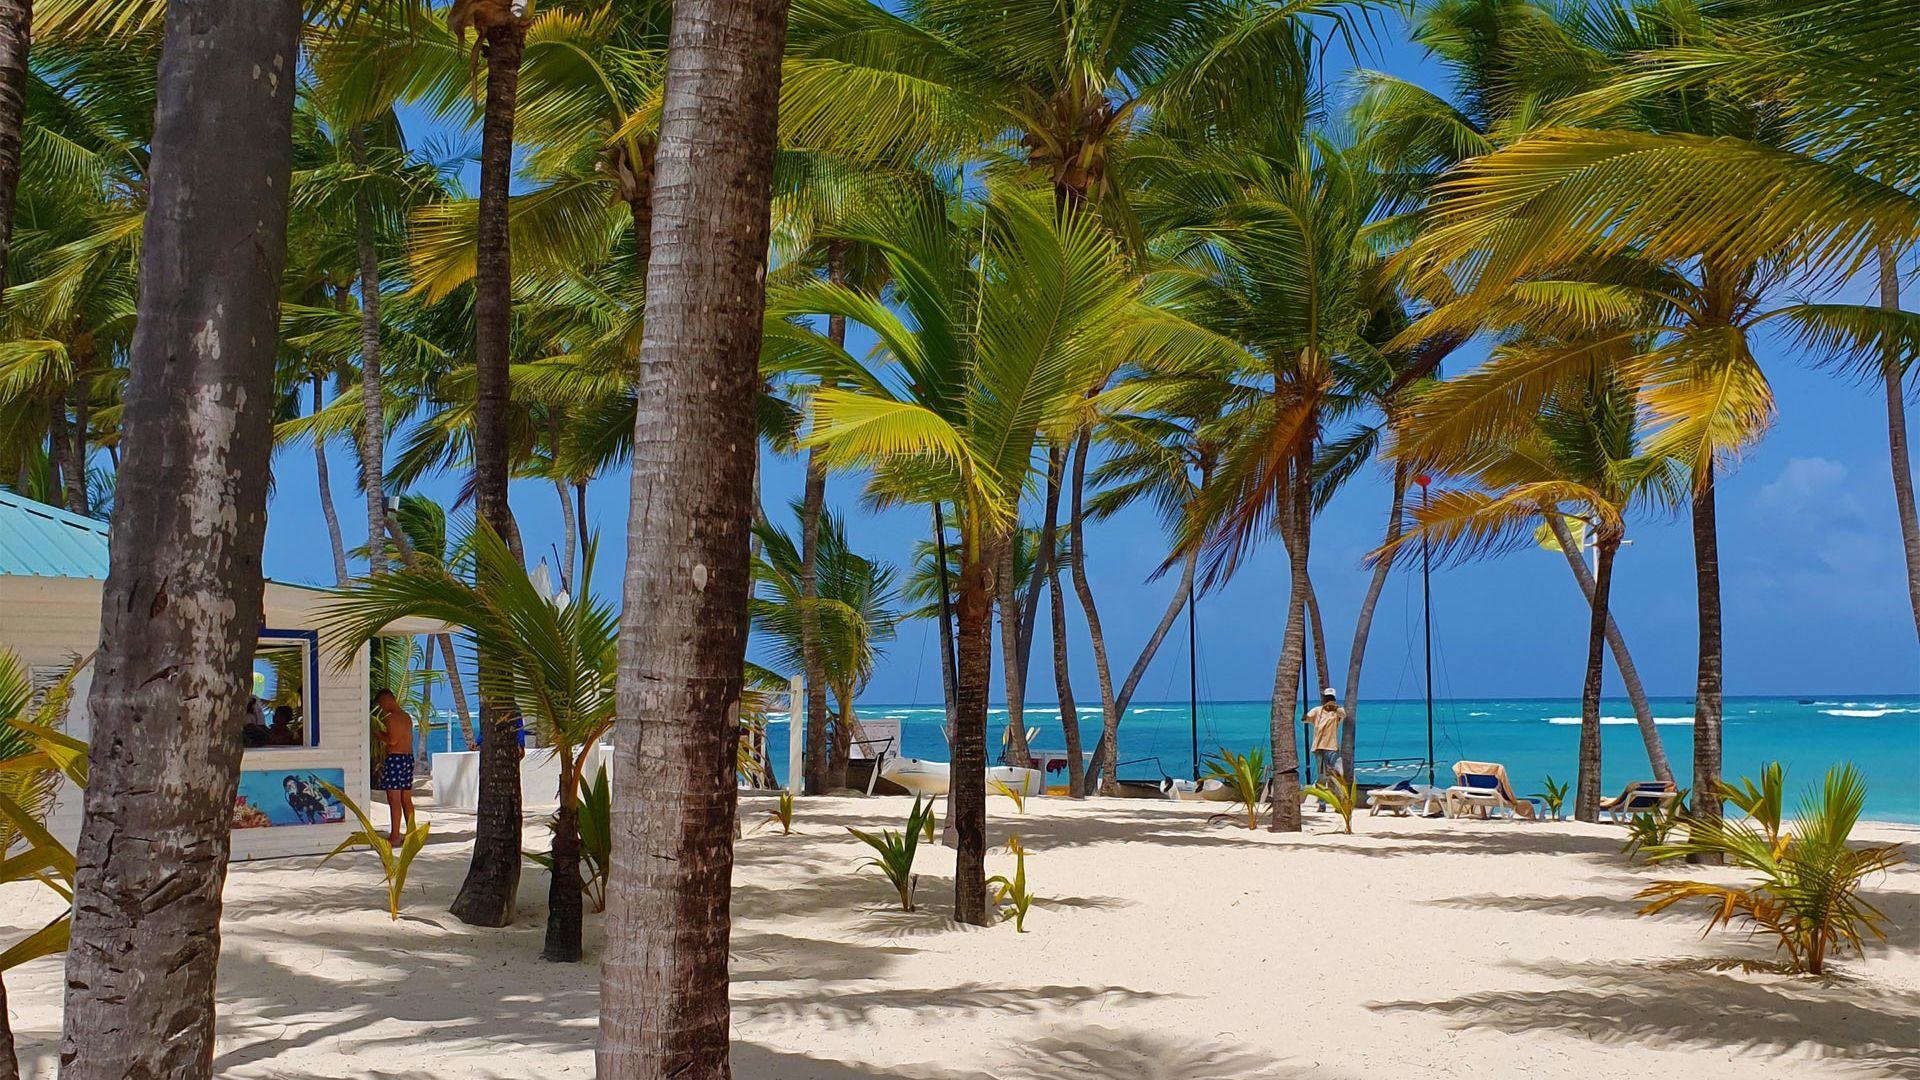 Sejur plaja Barcelo Hotels & Resorts Punta Cana, 9 zile - 22 august 2021